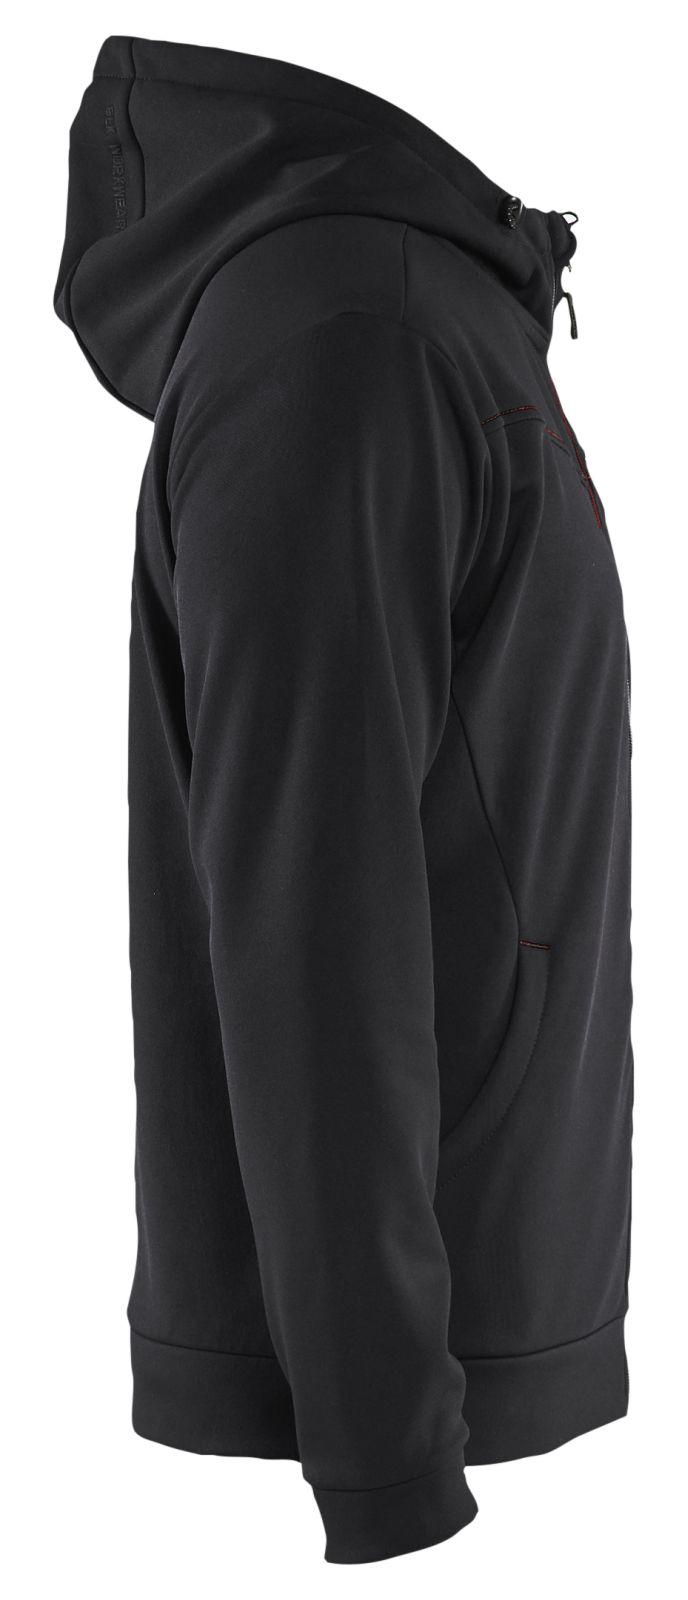 Blaklader Vesten 33632526 zwart-rood(9956)